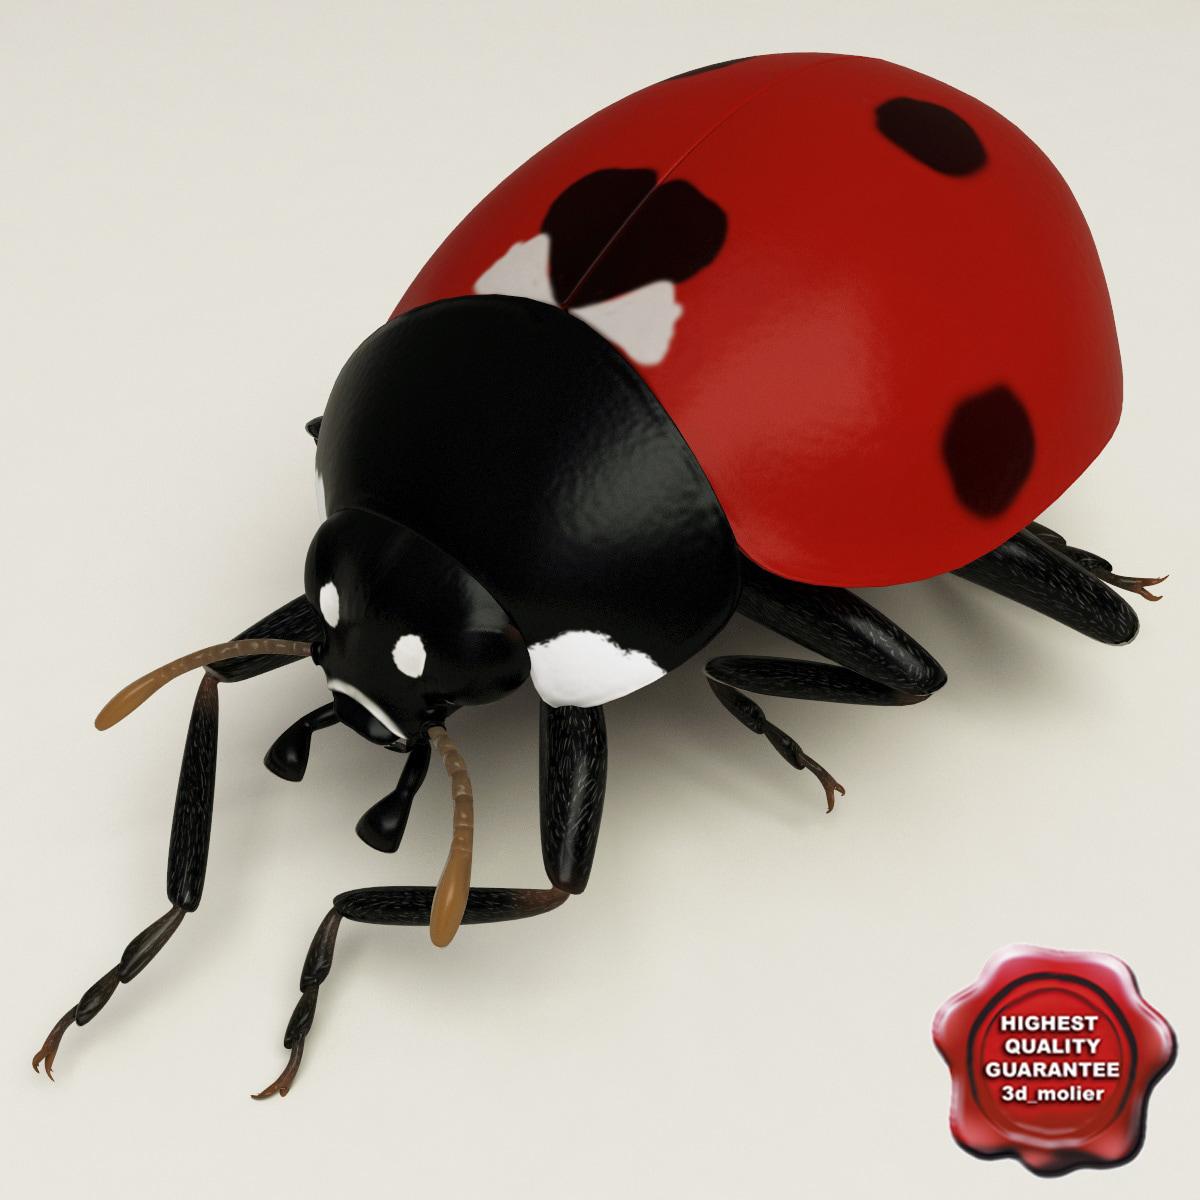 Ladybug_Pose7_00.jpg